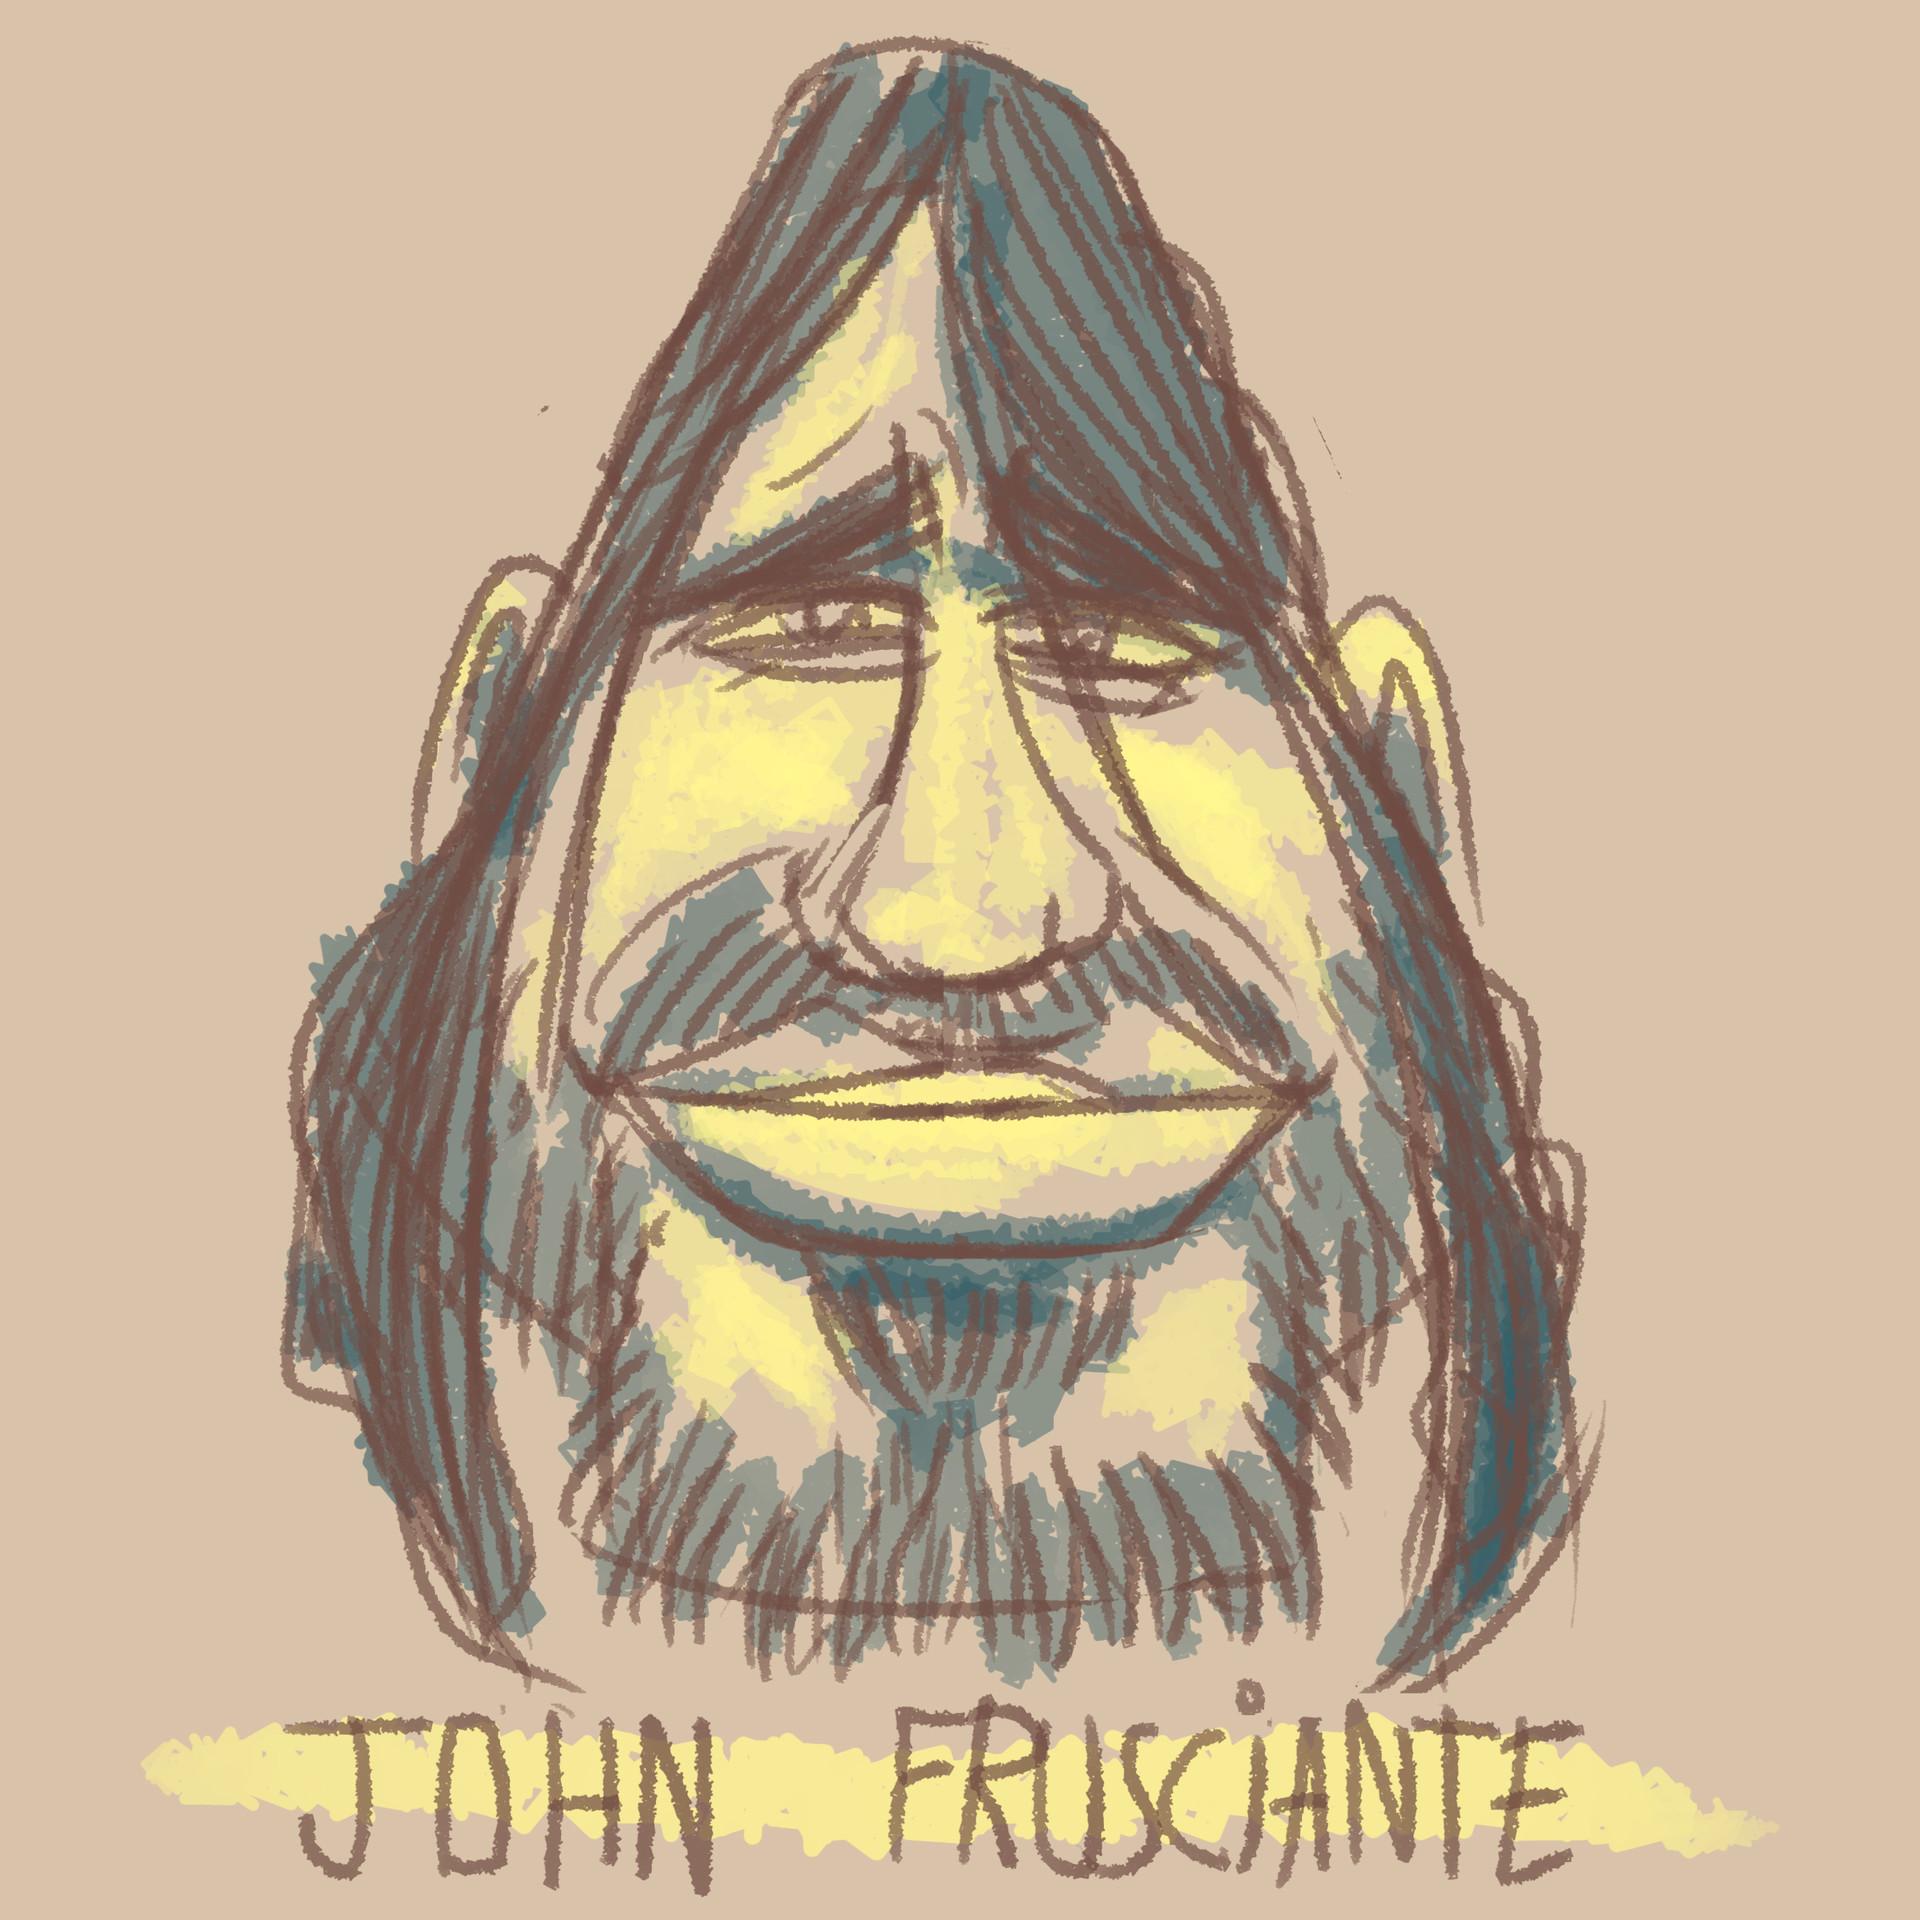 Marcos torres john frusciante